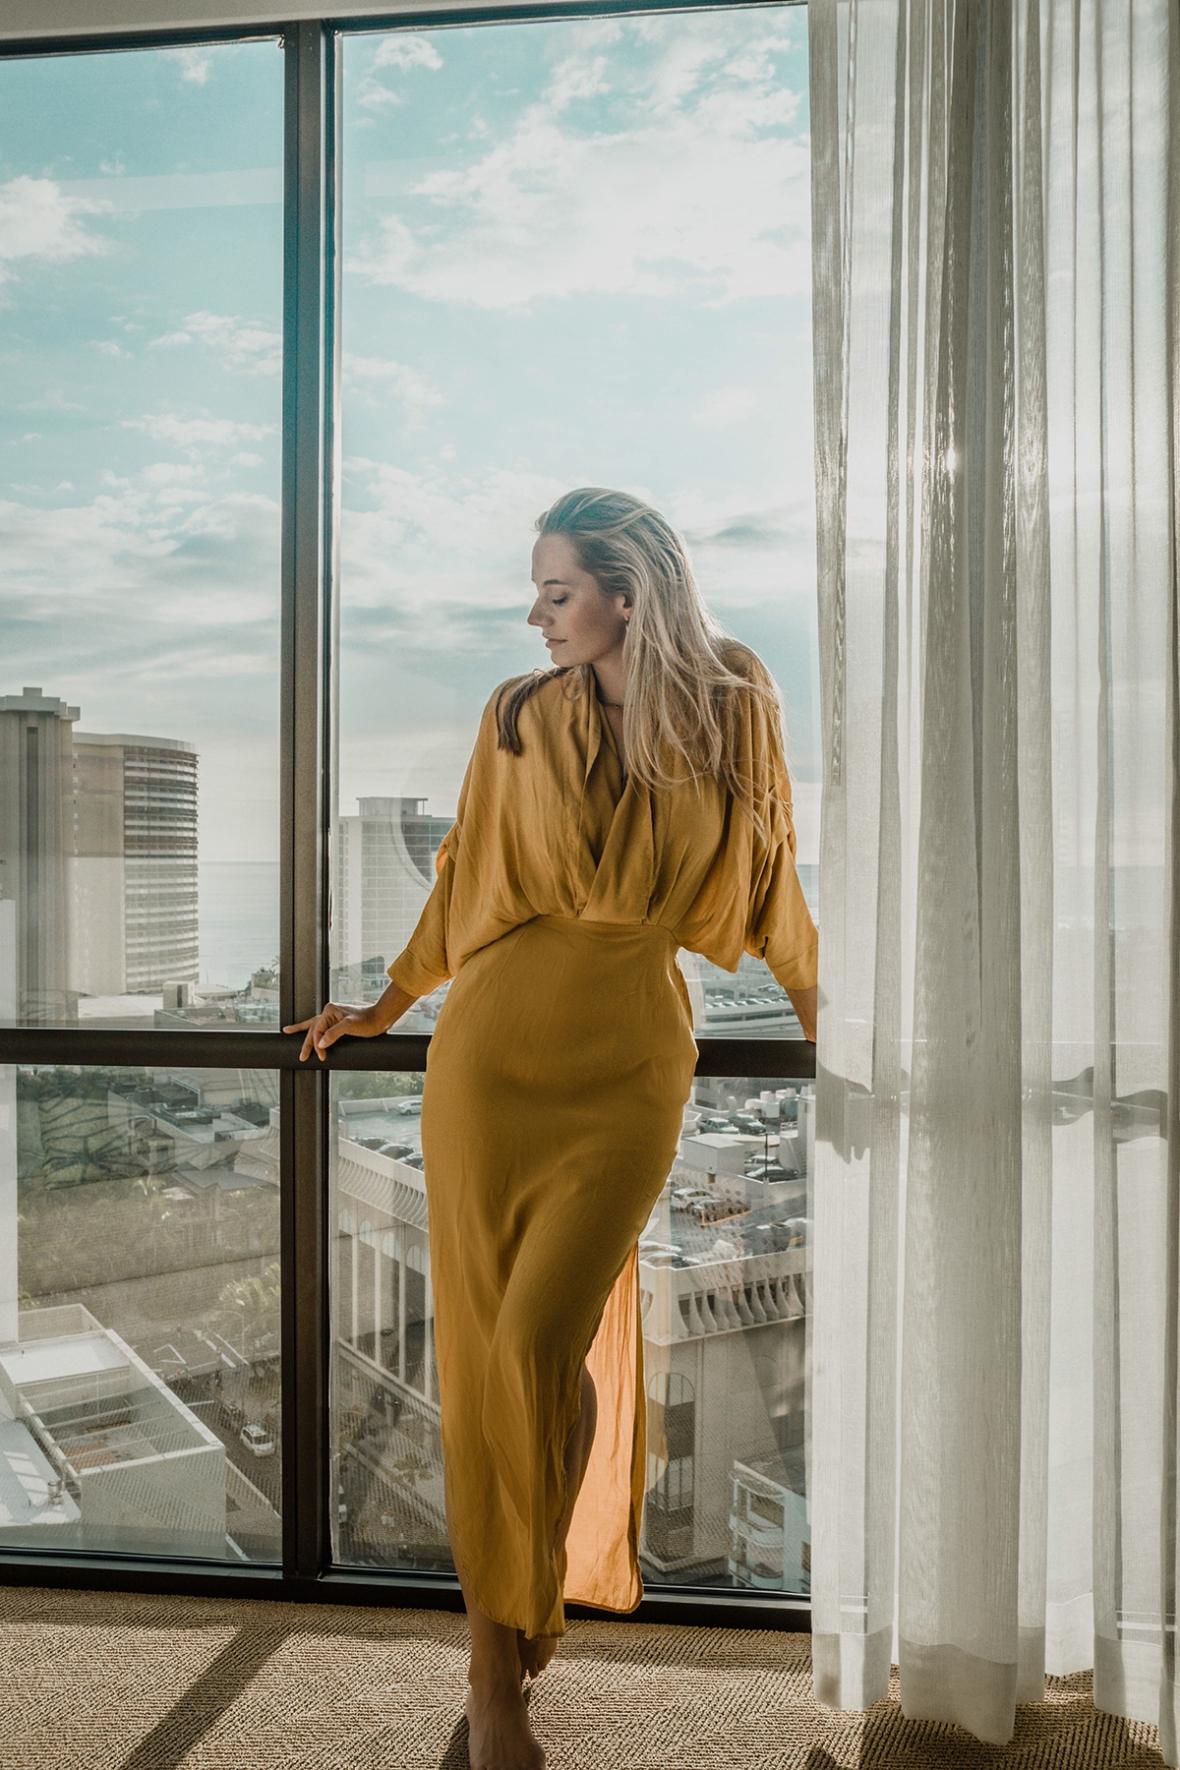 Hyatt Centric Hawaii Waikiki Merel Hotel Review